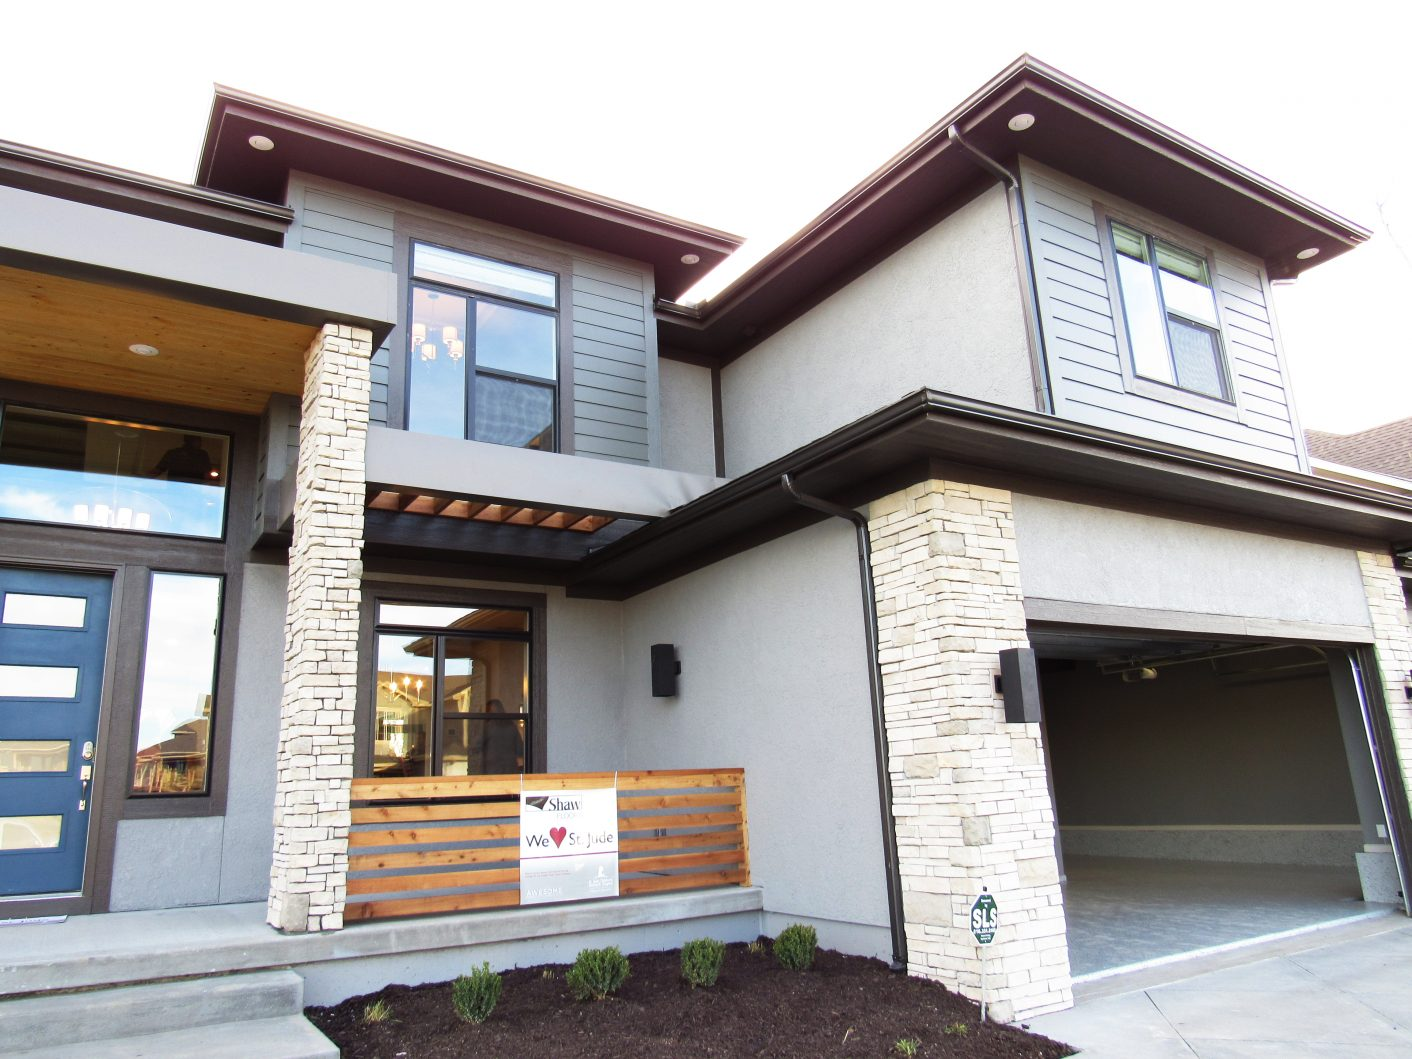 2017 St. Jude Dream Home